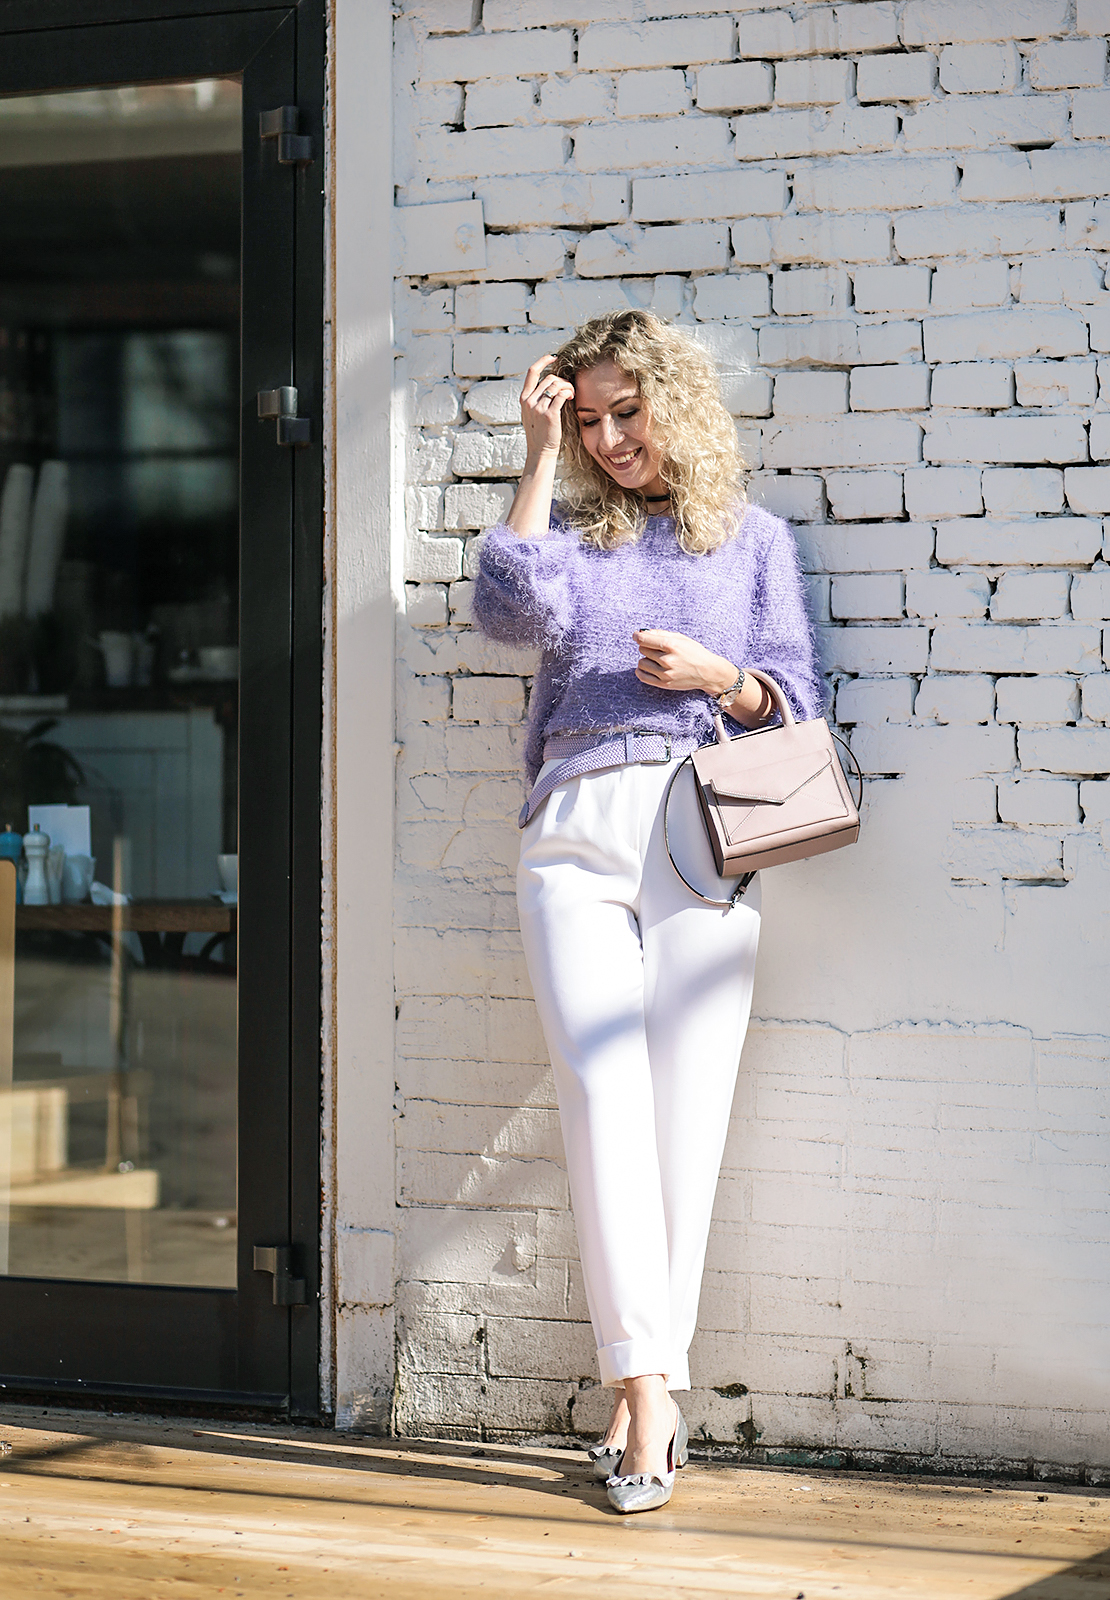 Rita_maslova_ritalifestyle_moscow_fashion_blogger_white_pants_violet_4